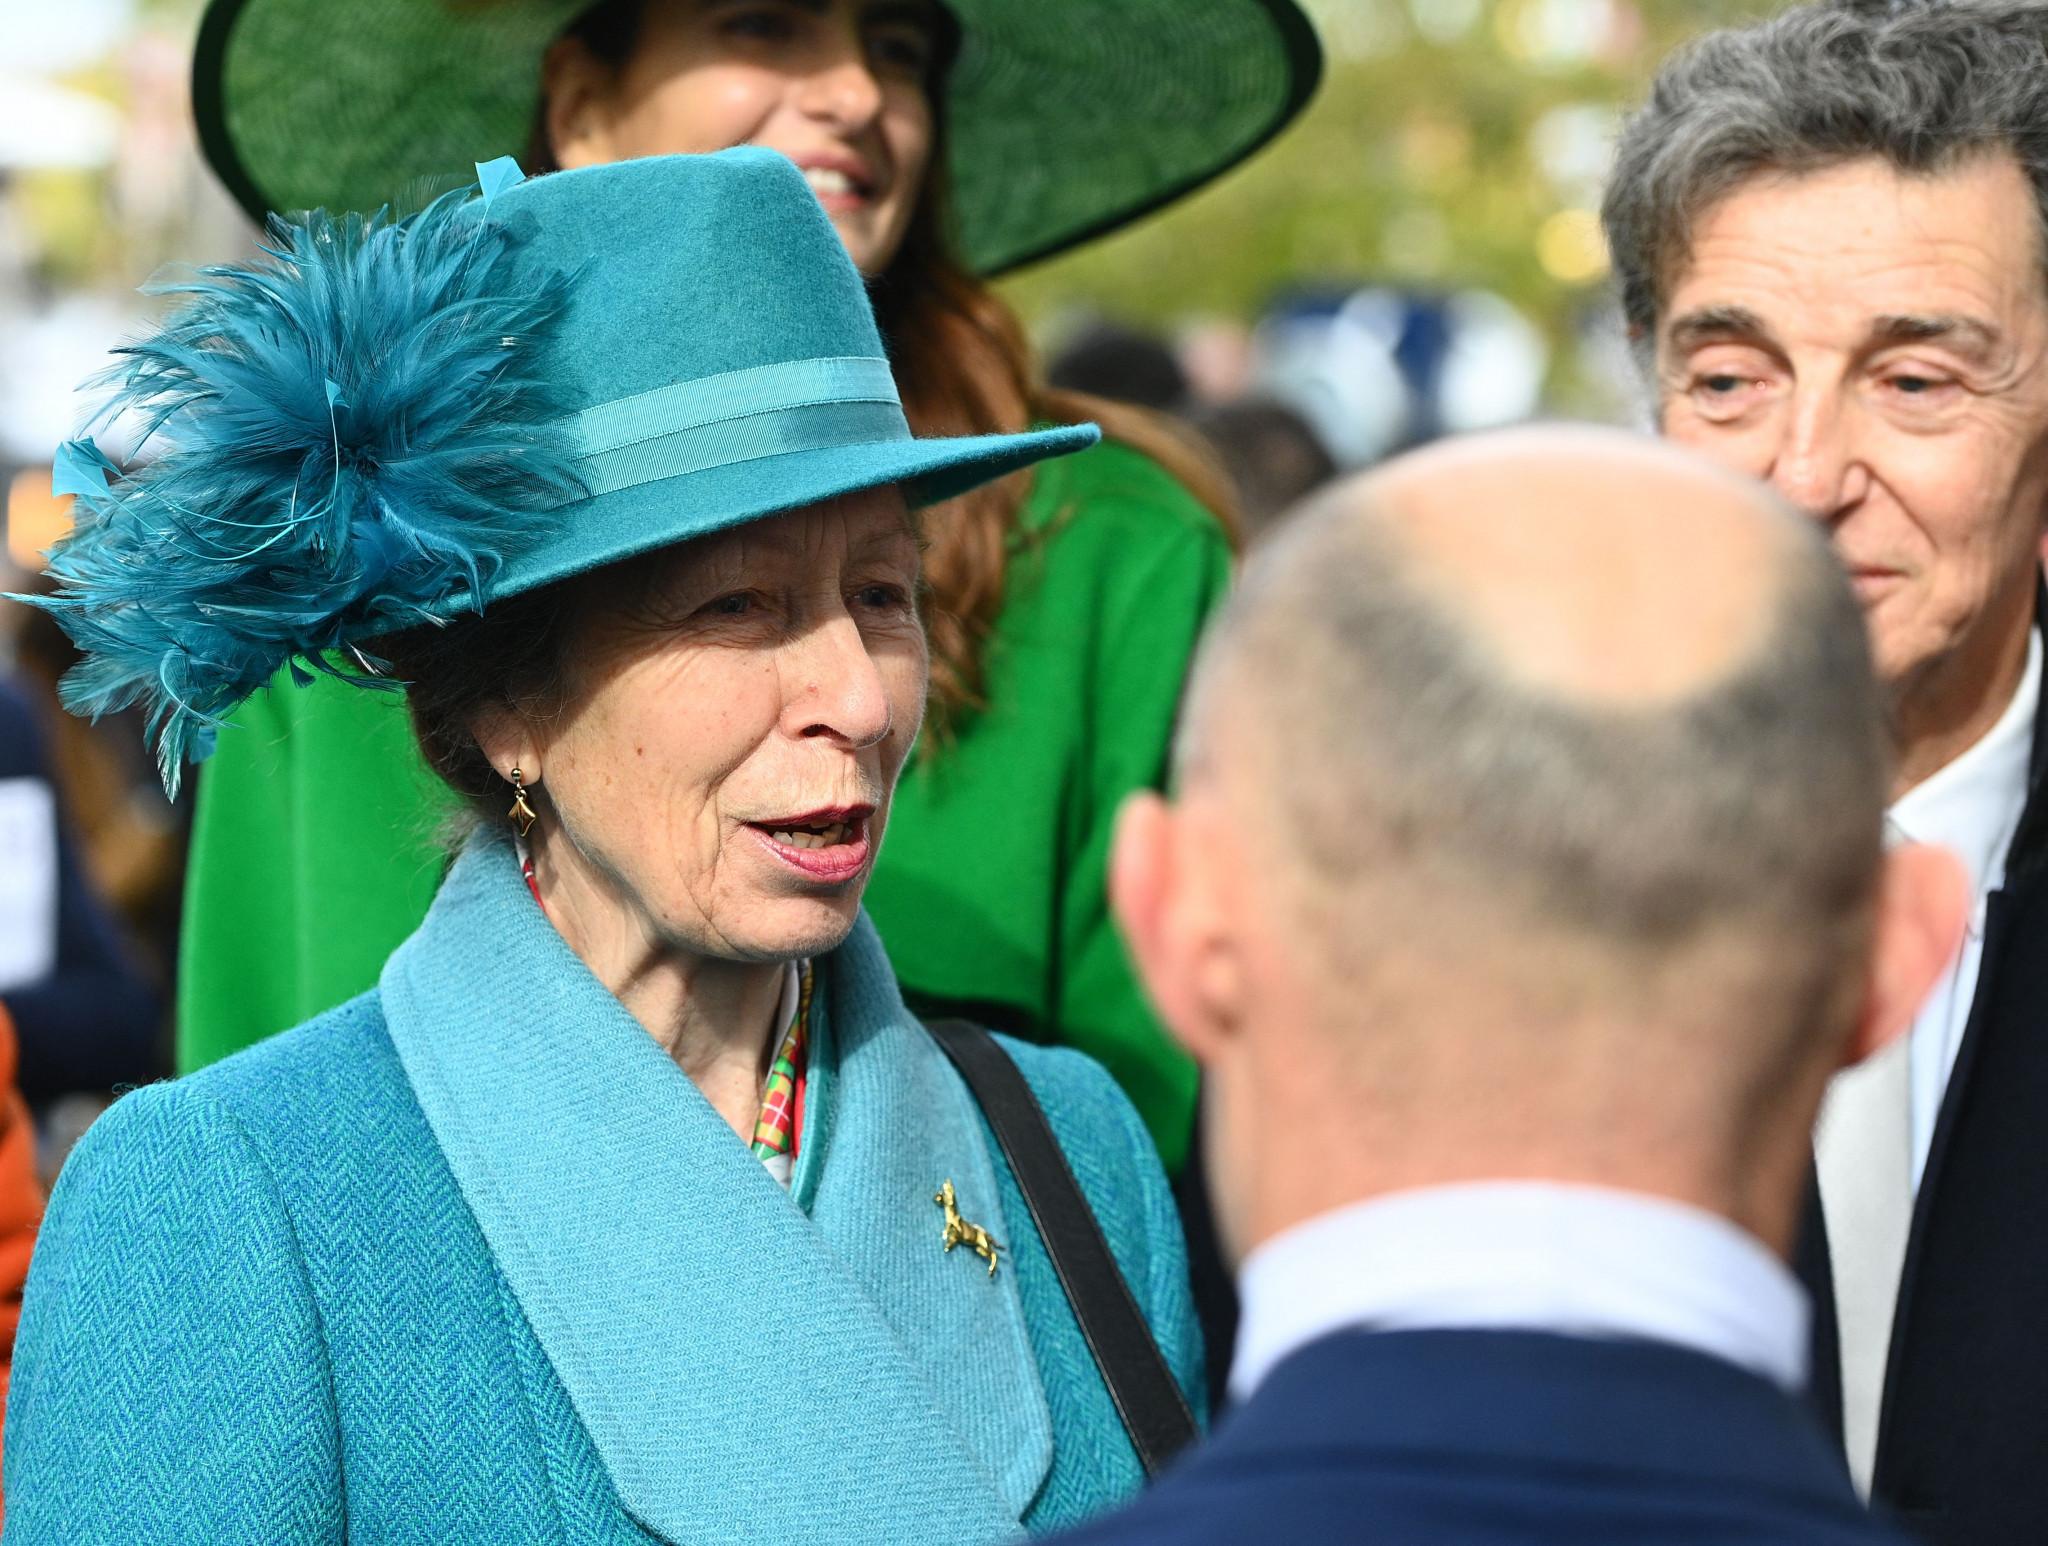 Princess Anne meets Paris 2024 representatives on visit to the city